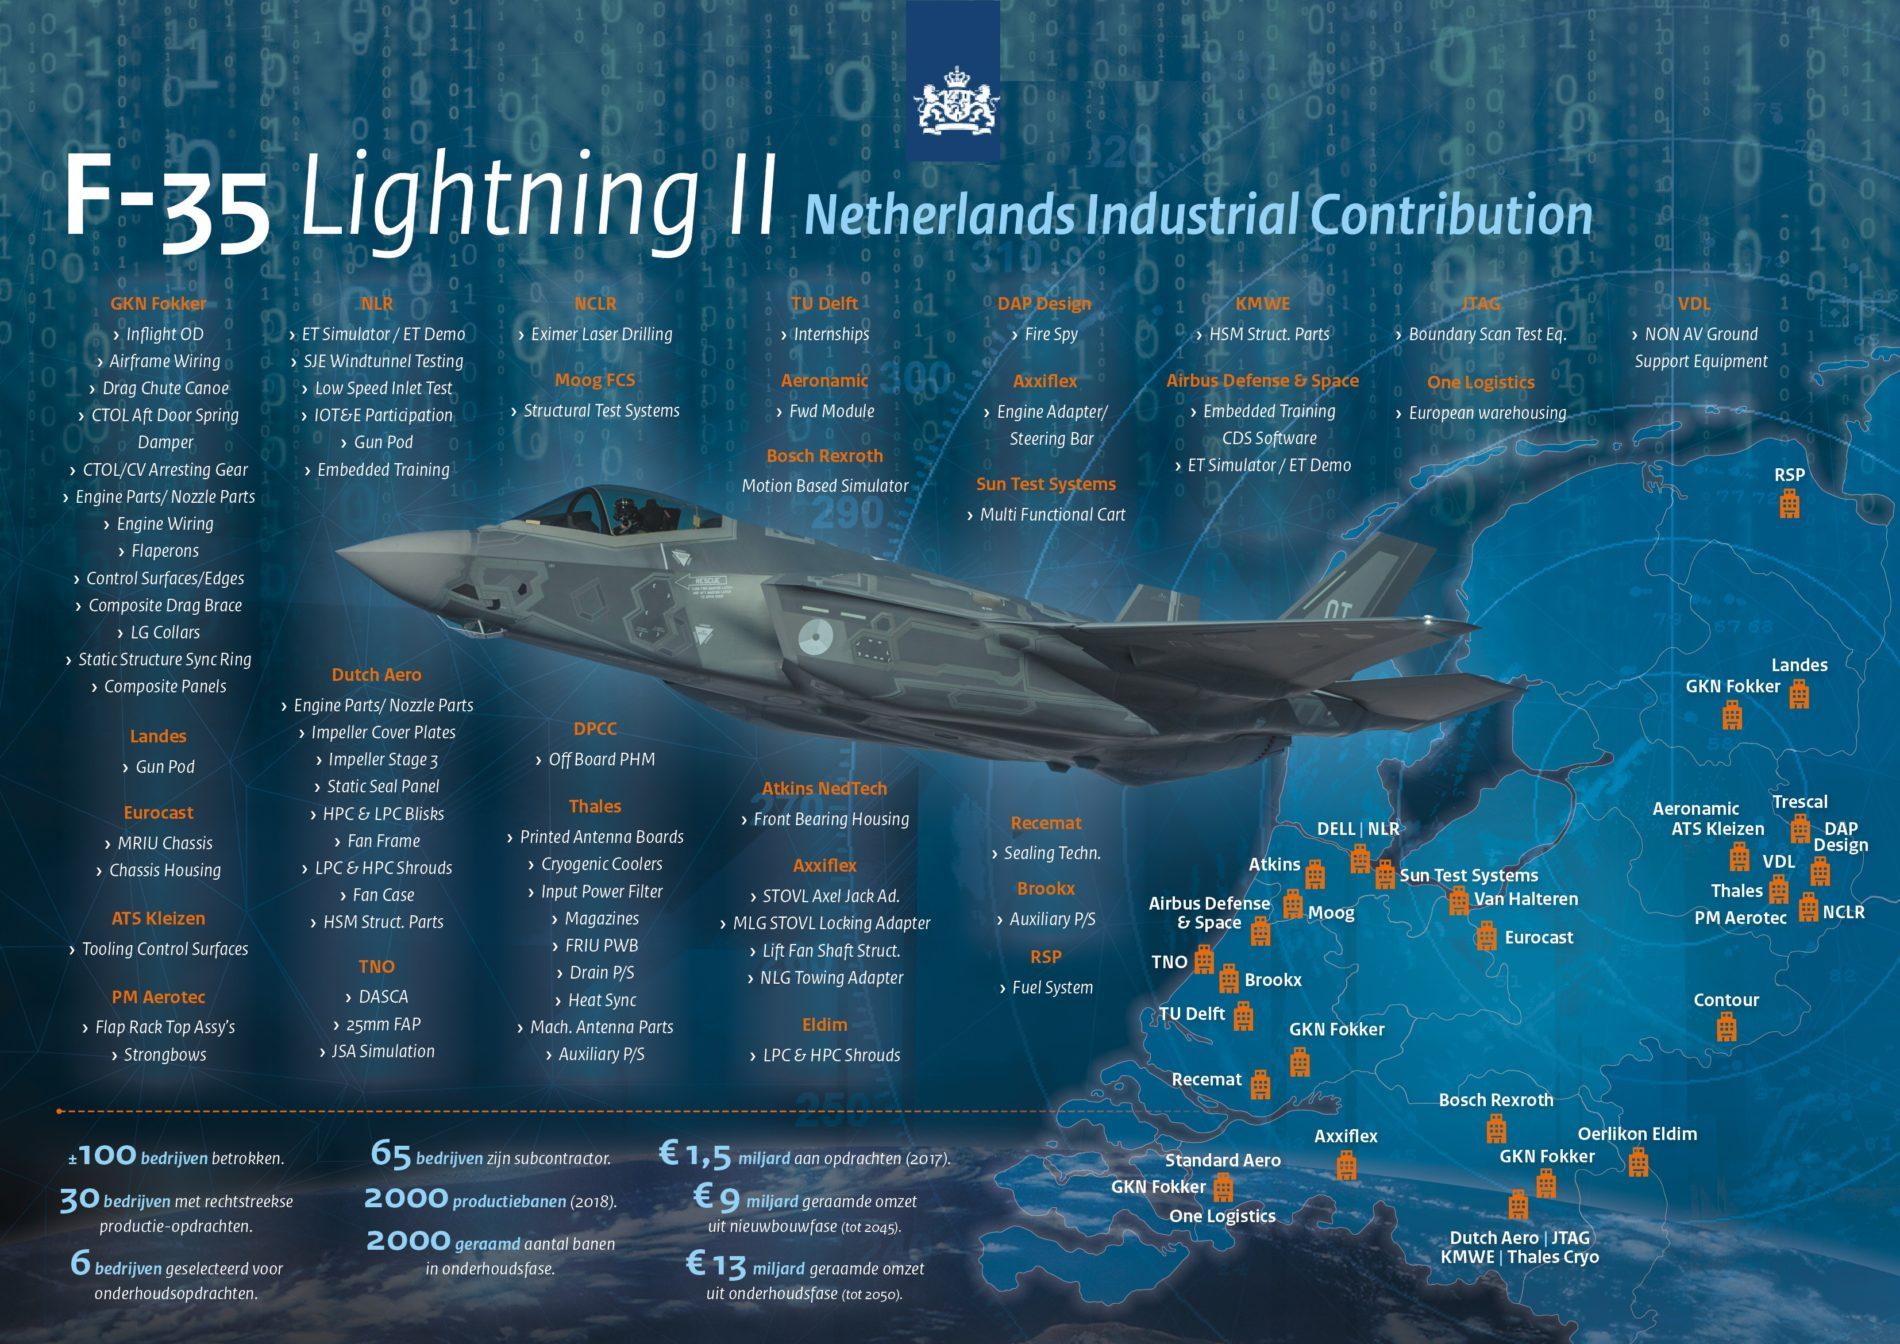 F-35 Lightning II Netherlands Industrial Contribution